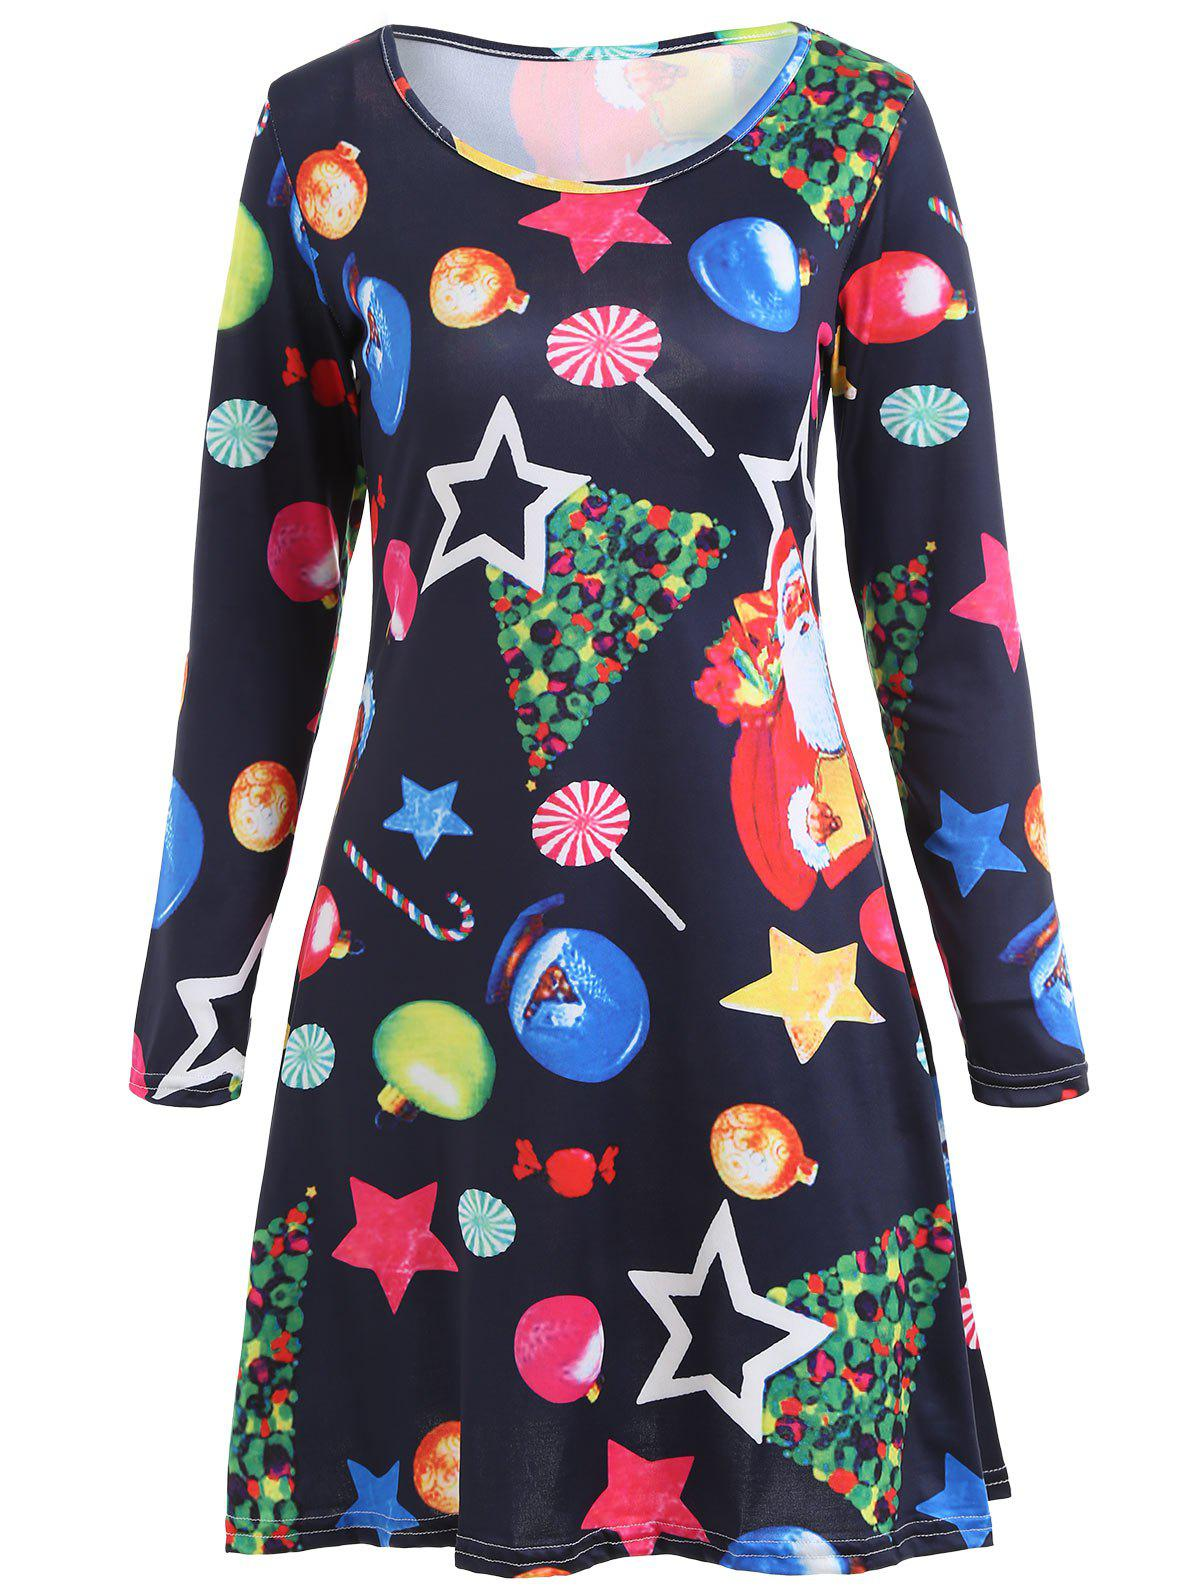 Christmas Patterned Long Sleeve Dress 233261201